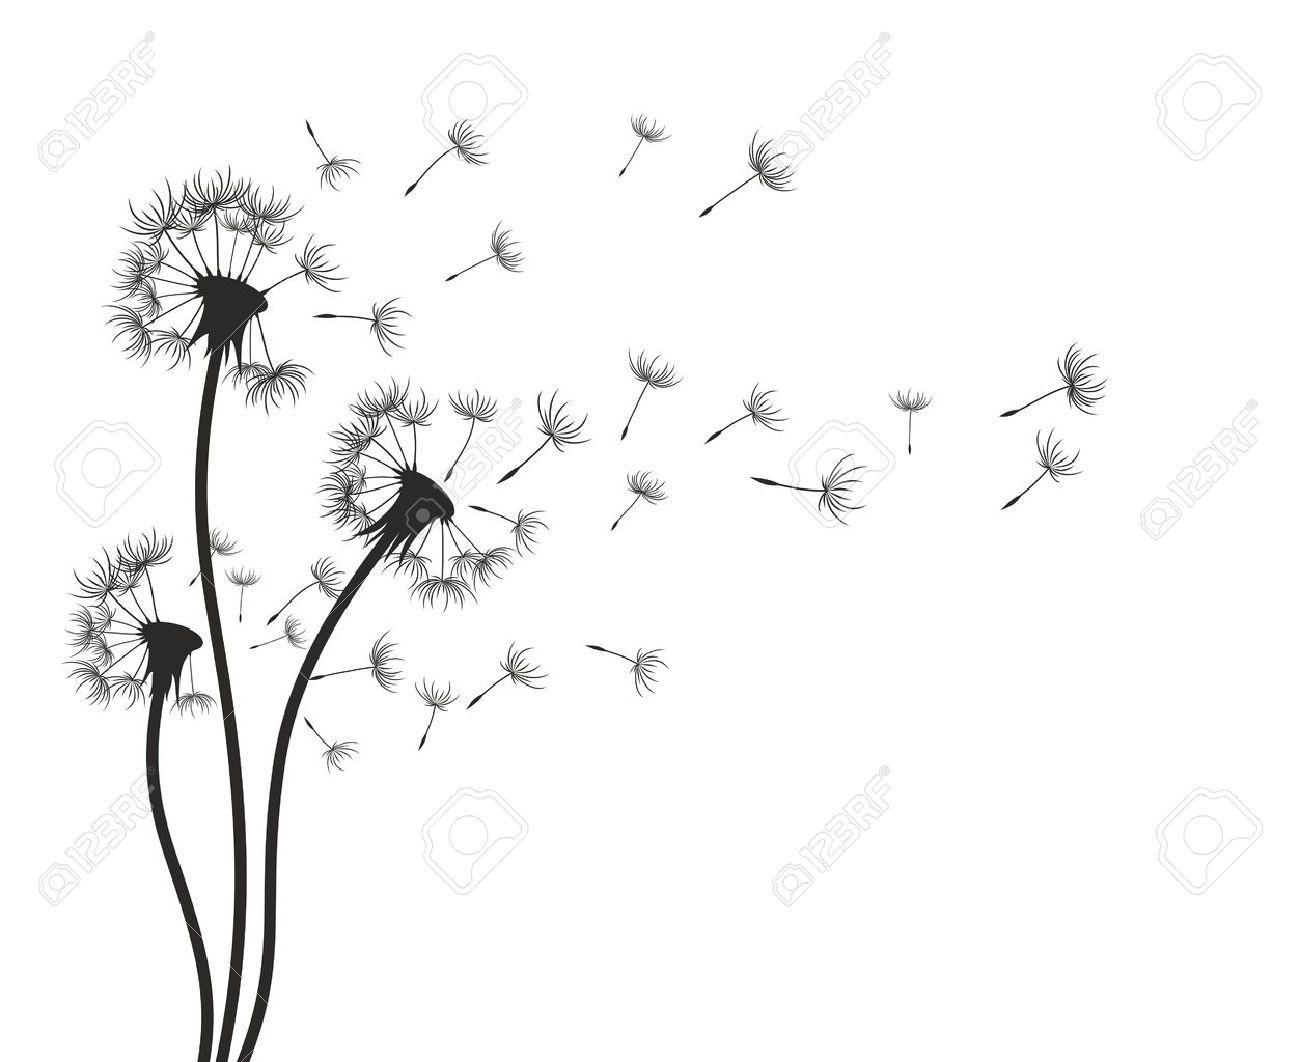 Dandelions on a wind a sketch. - 50704620